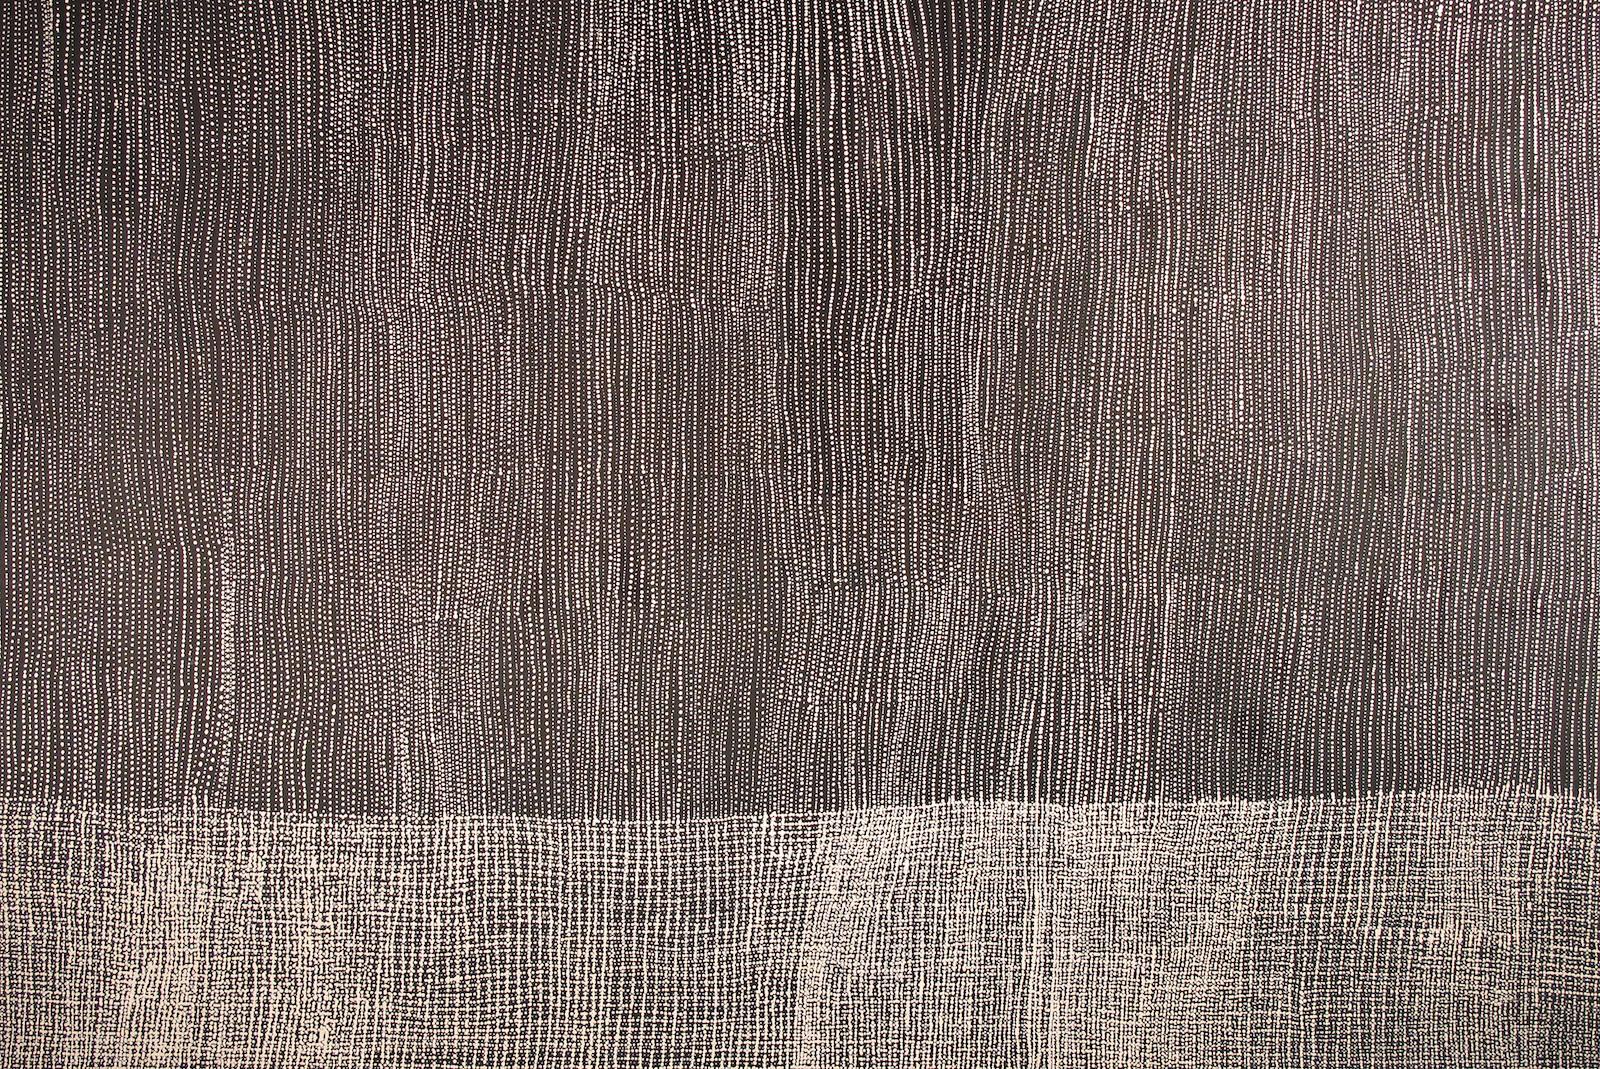 Elsie Granites Napanangka 'Mina Mina' ACrylic on Linen 161cm x 236cm #14518